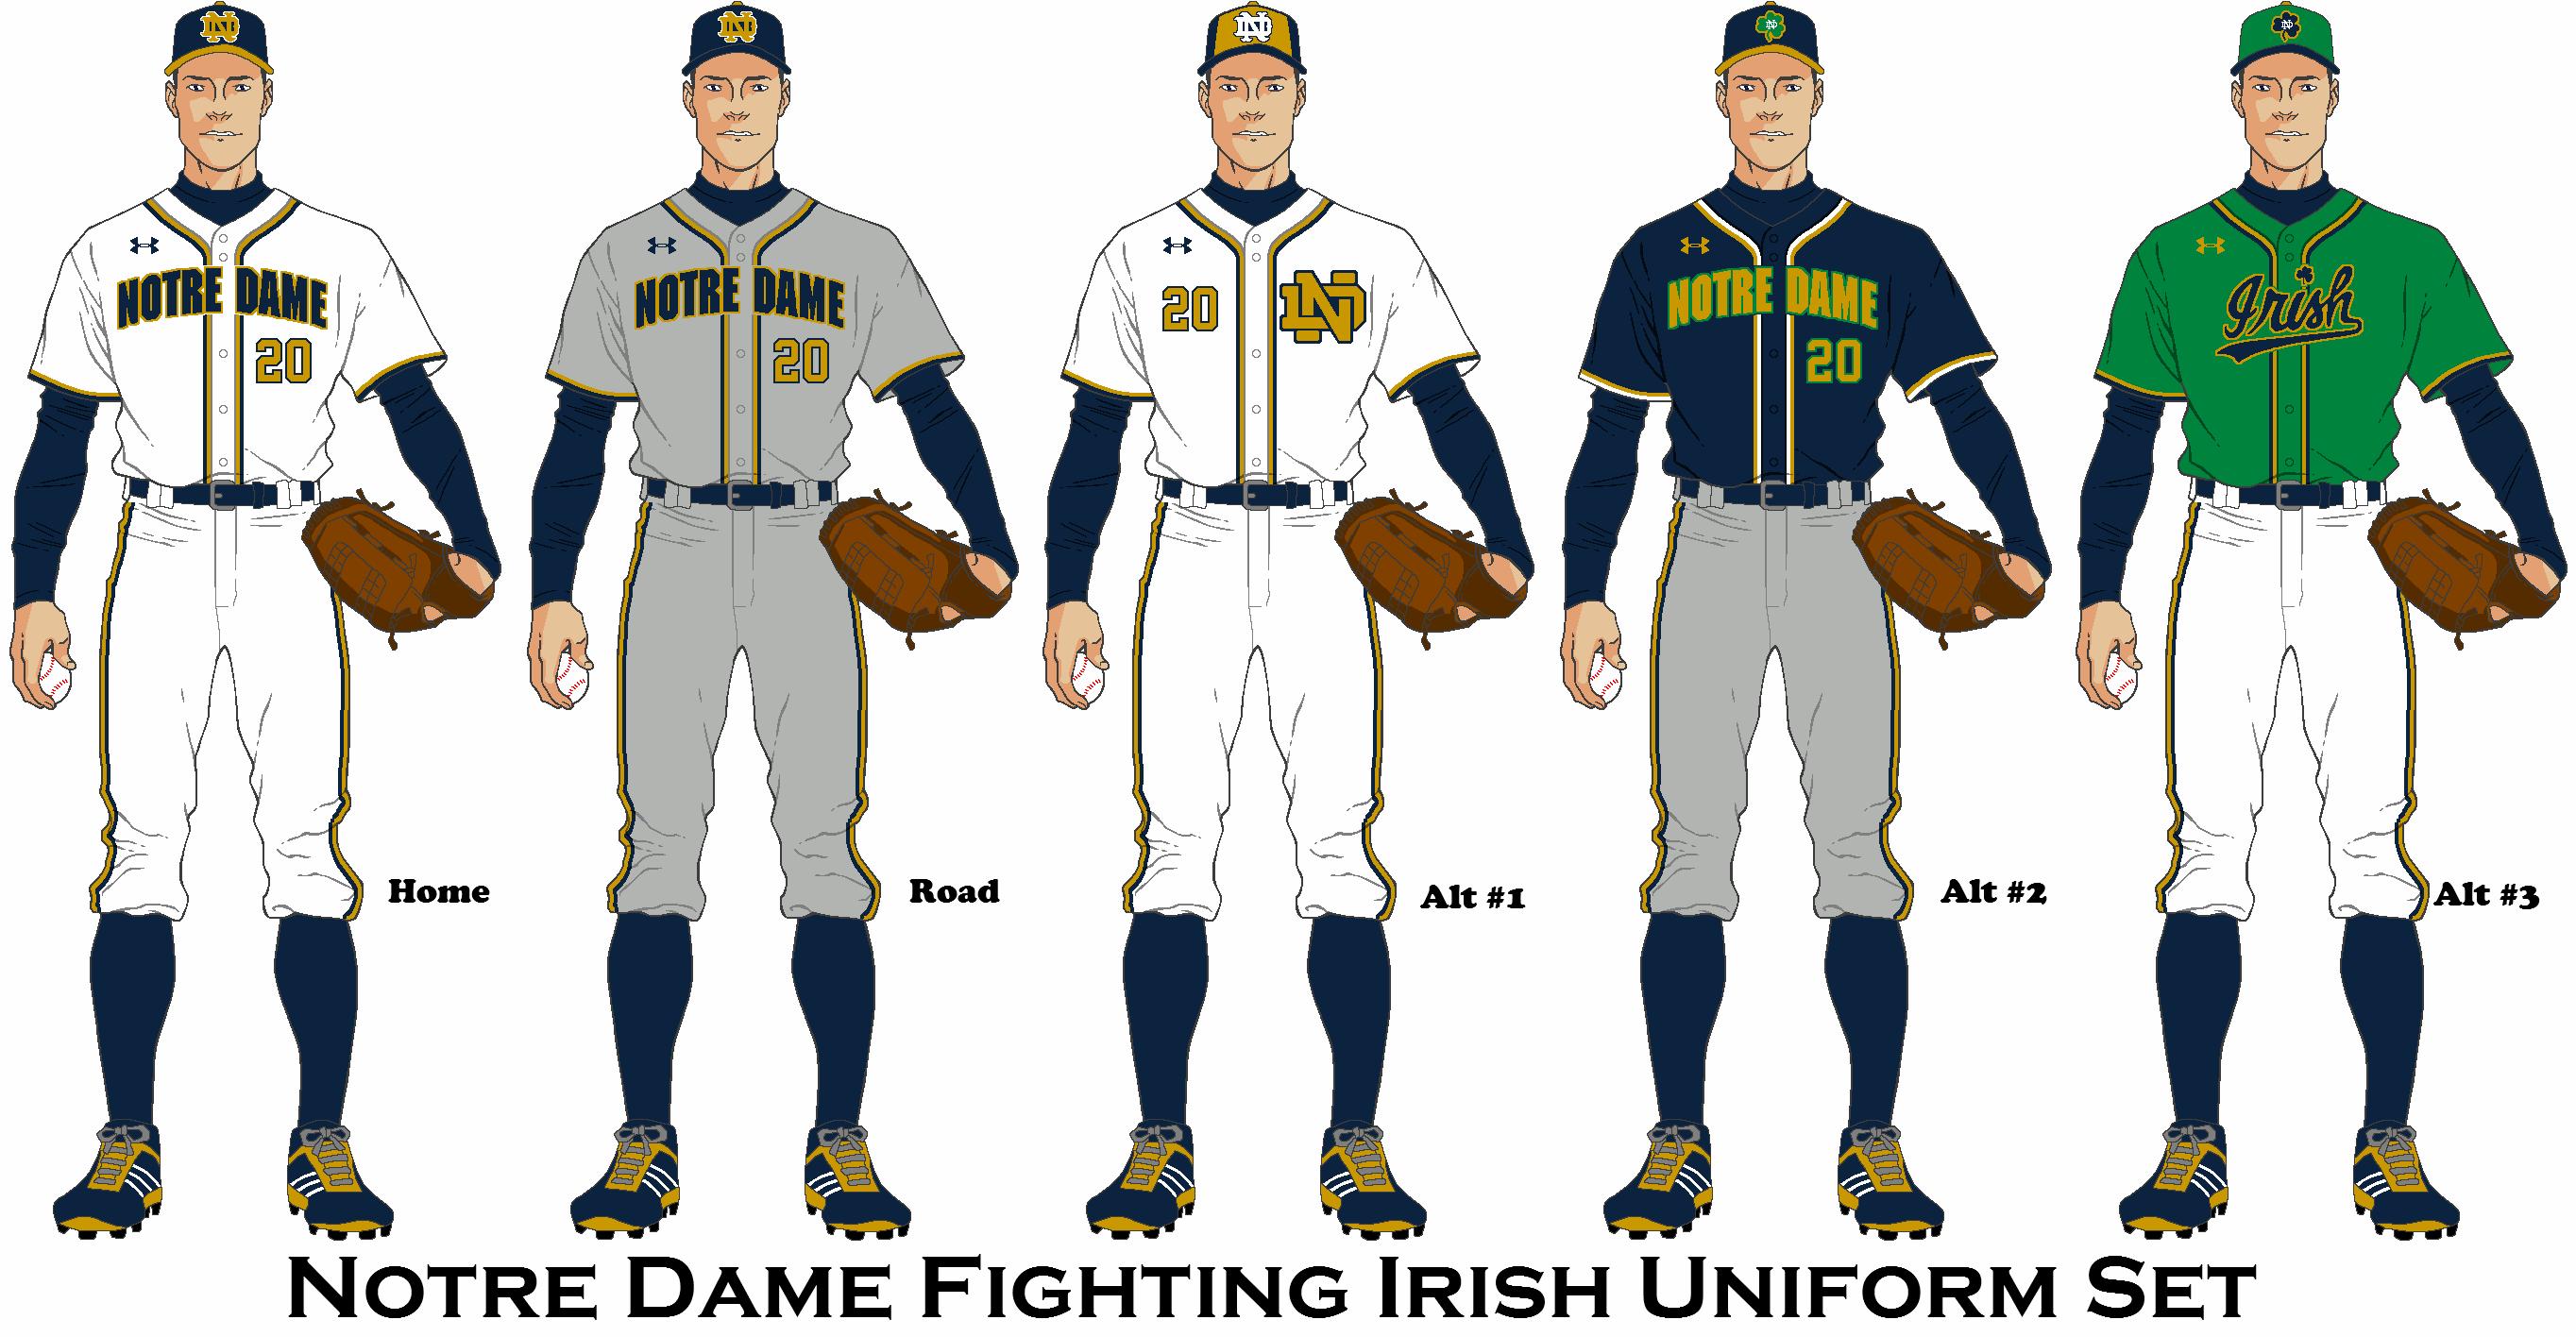 Notre Dame Fighting Irish Baseball Uniform Concept Notre Dame Fighting Irish Baseball Uniform Baseball